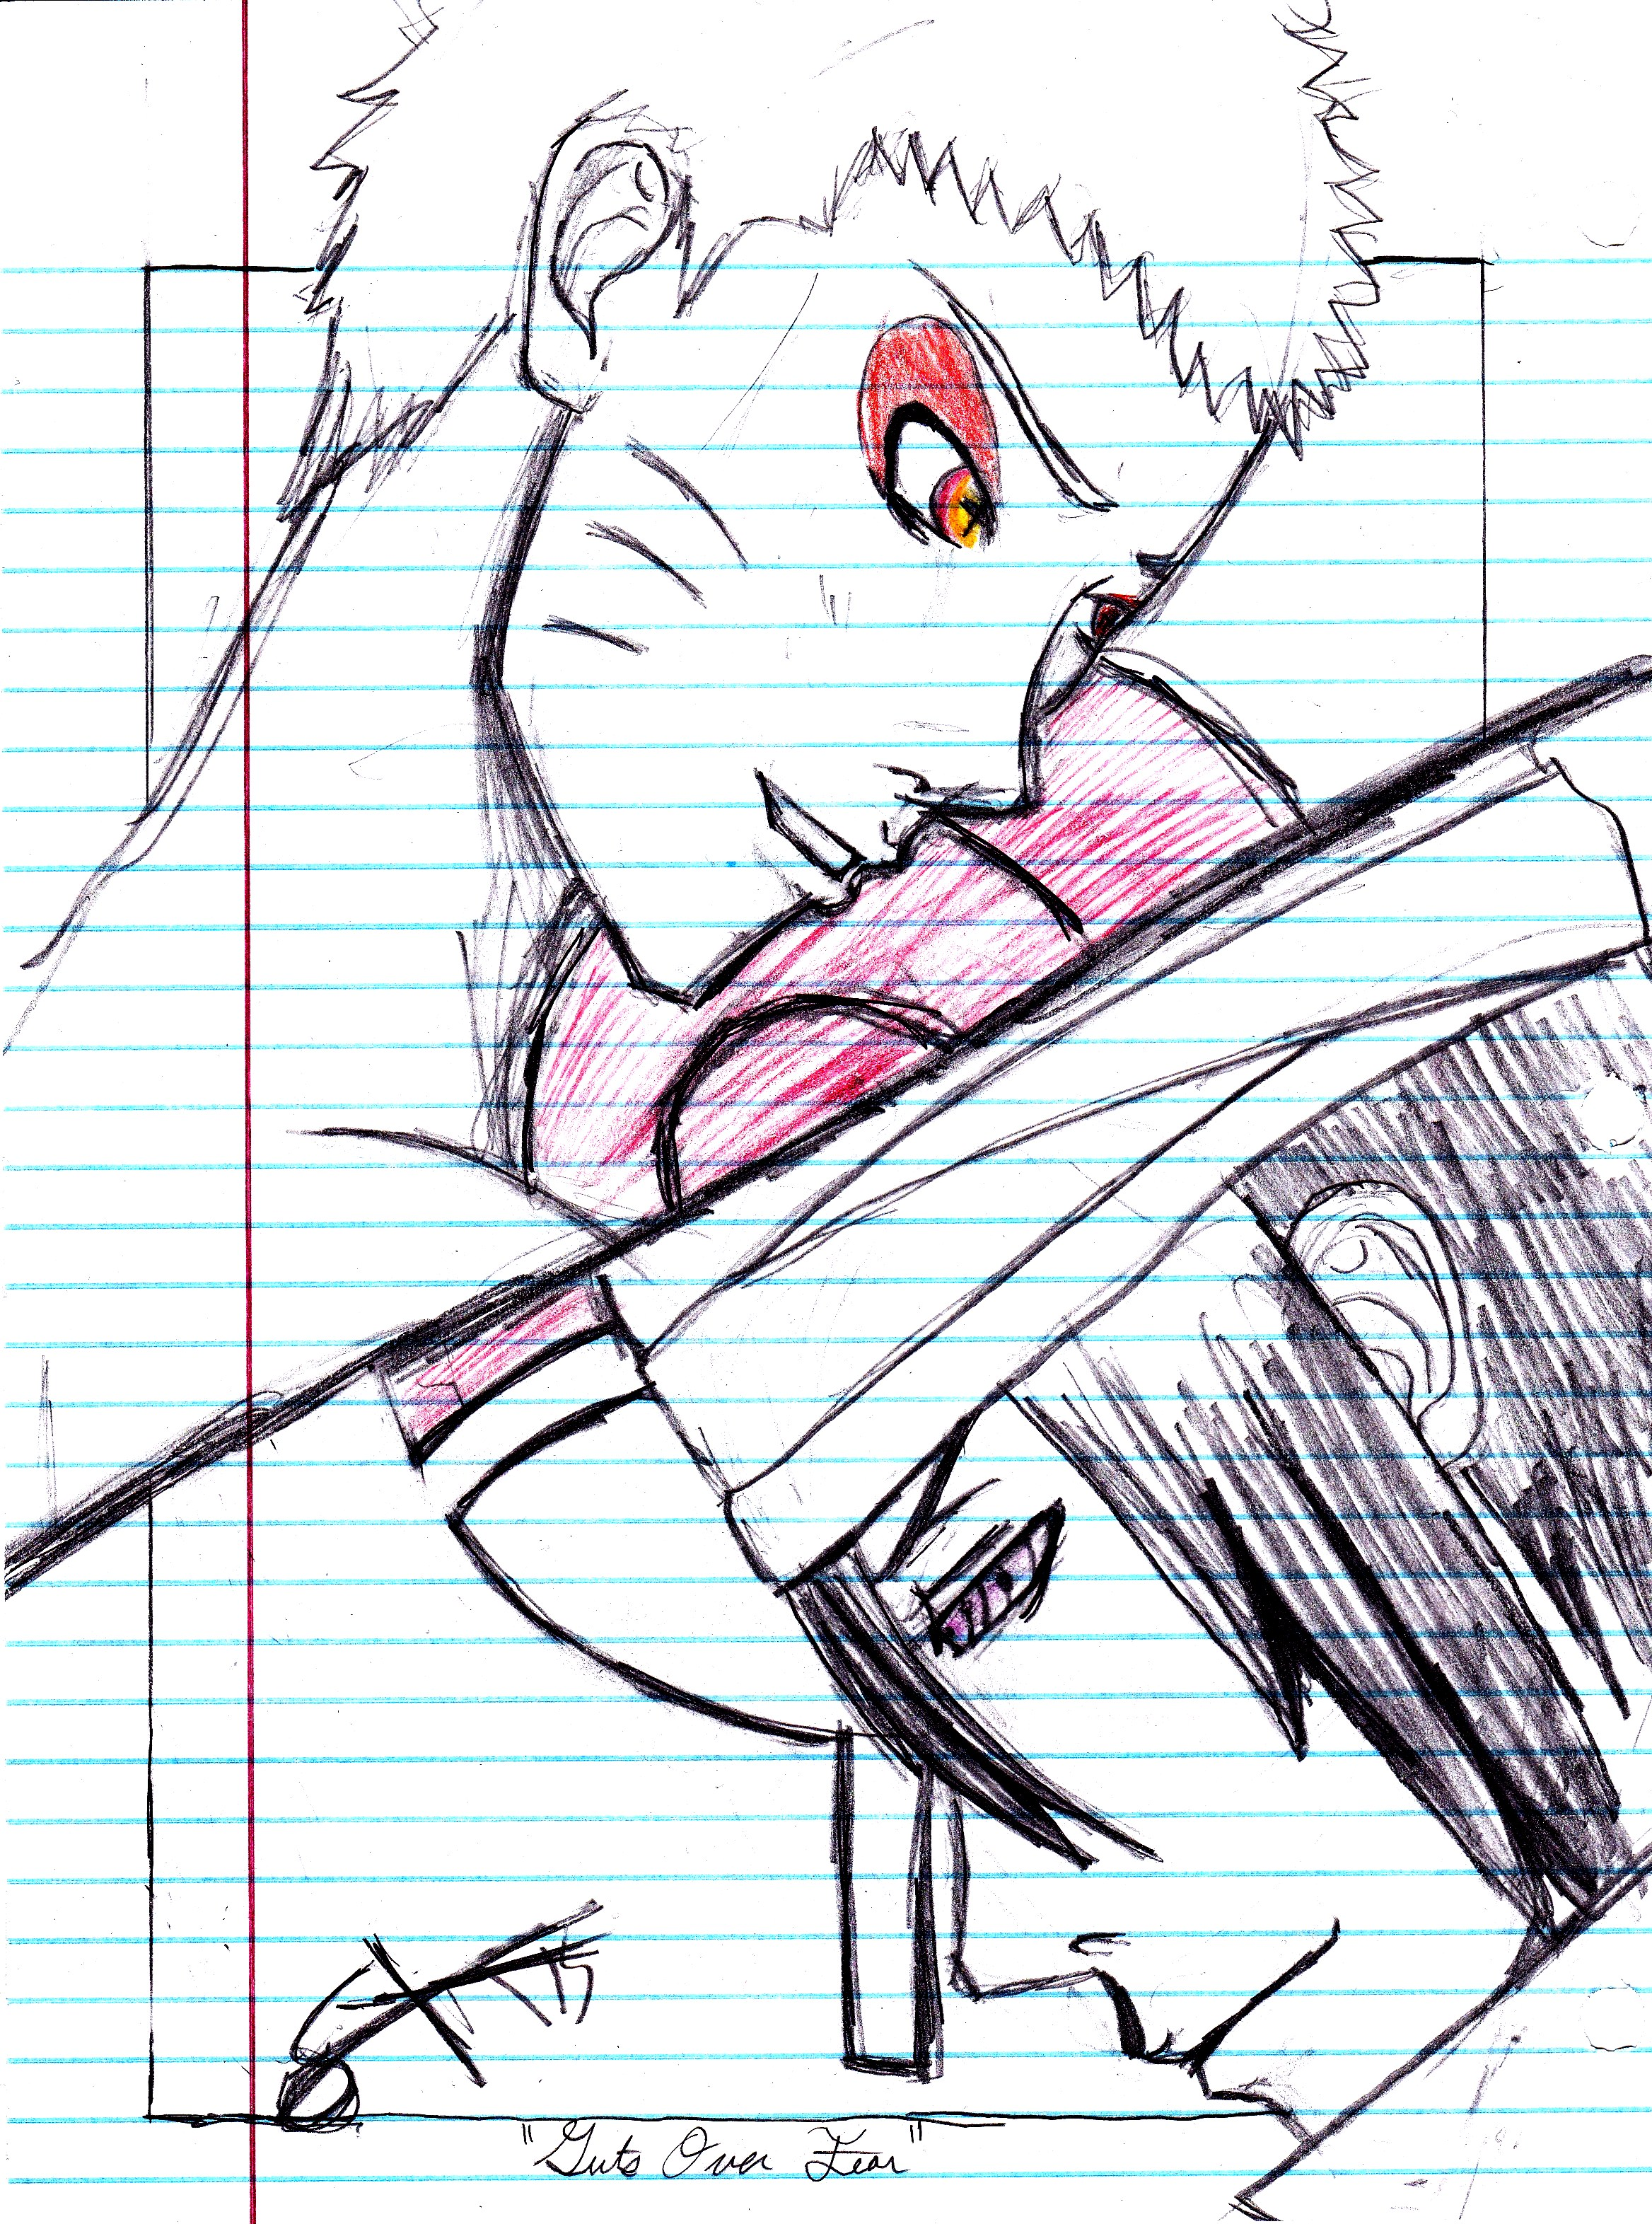 2336x3144 Older Naruto And Sasuke Line Artsketchdoodle By Shaxra15